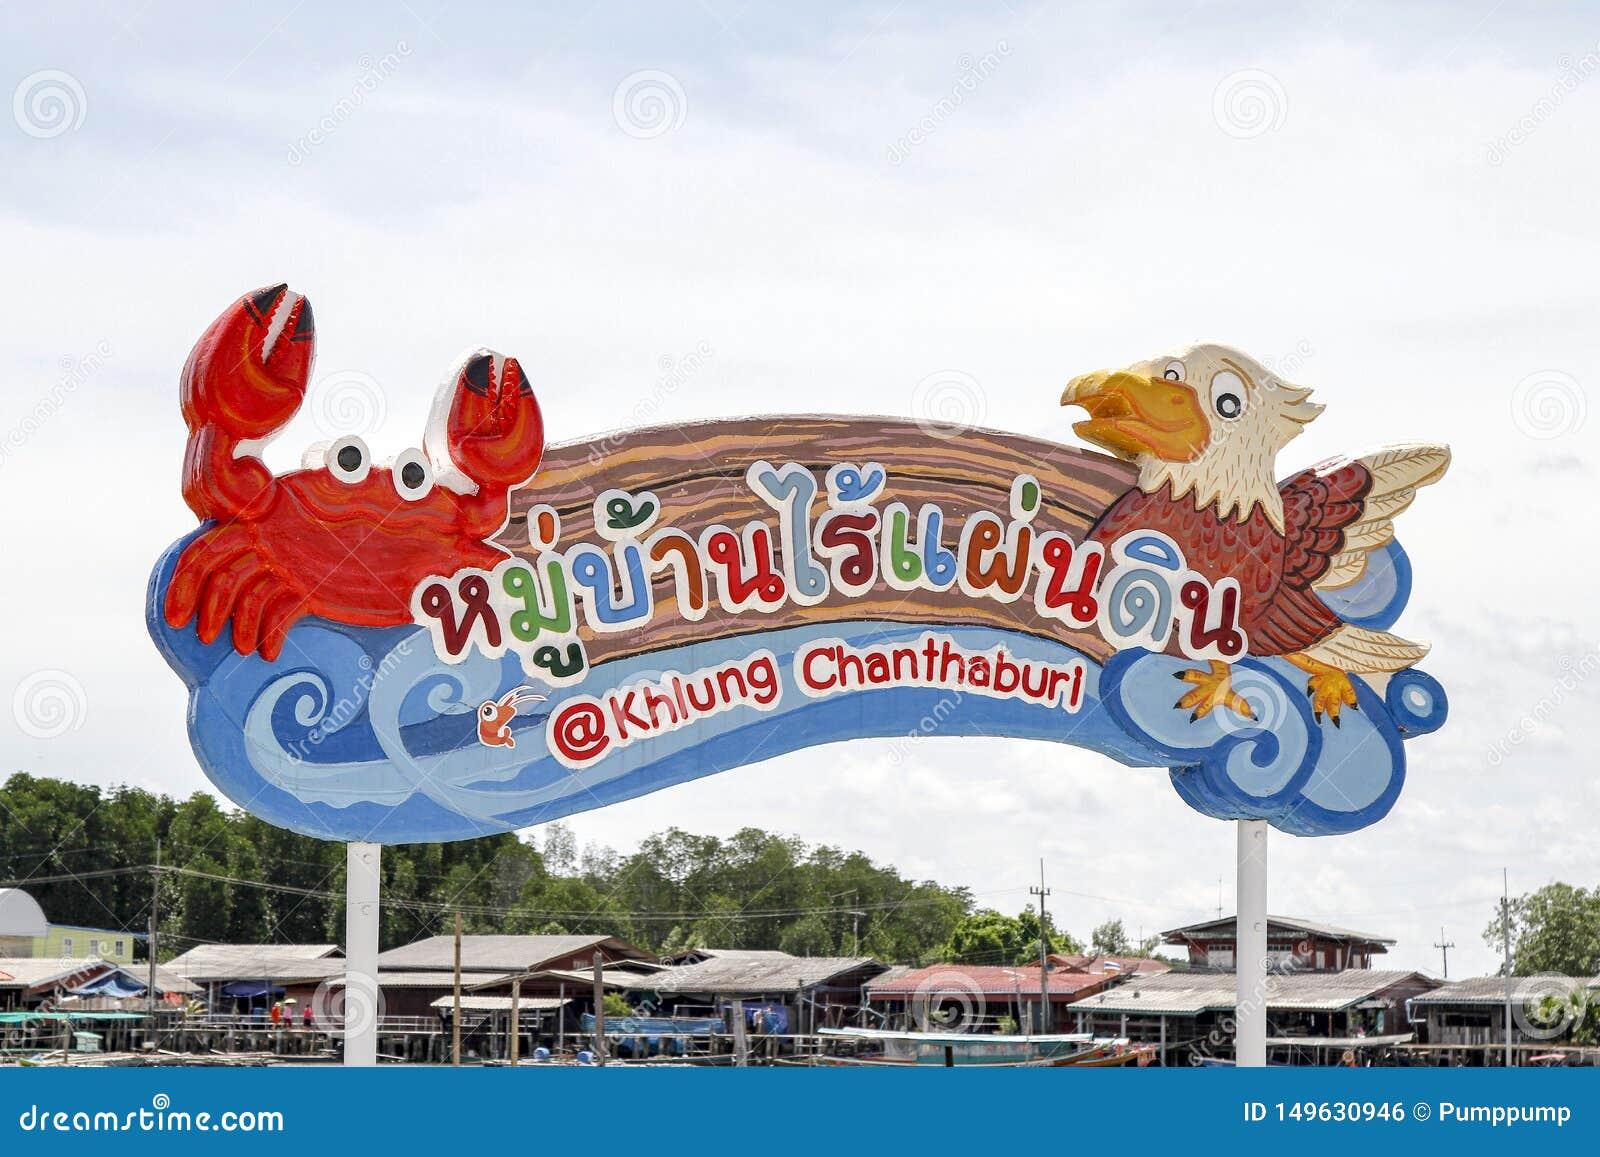 Chanthaburi, 1,2019 Ταϊλάνδη-Ιουνίου: Η ετικέτα ή το σημάδι για το όνομα ψαροχώρι το χωριό Chanthaburi, Ταϊλάνδη κανένας-εδάφους